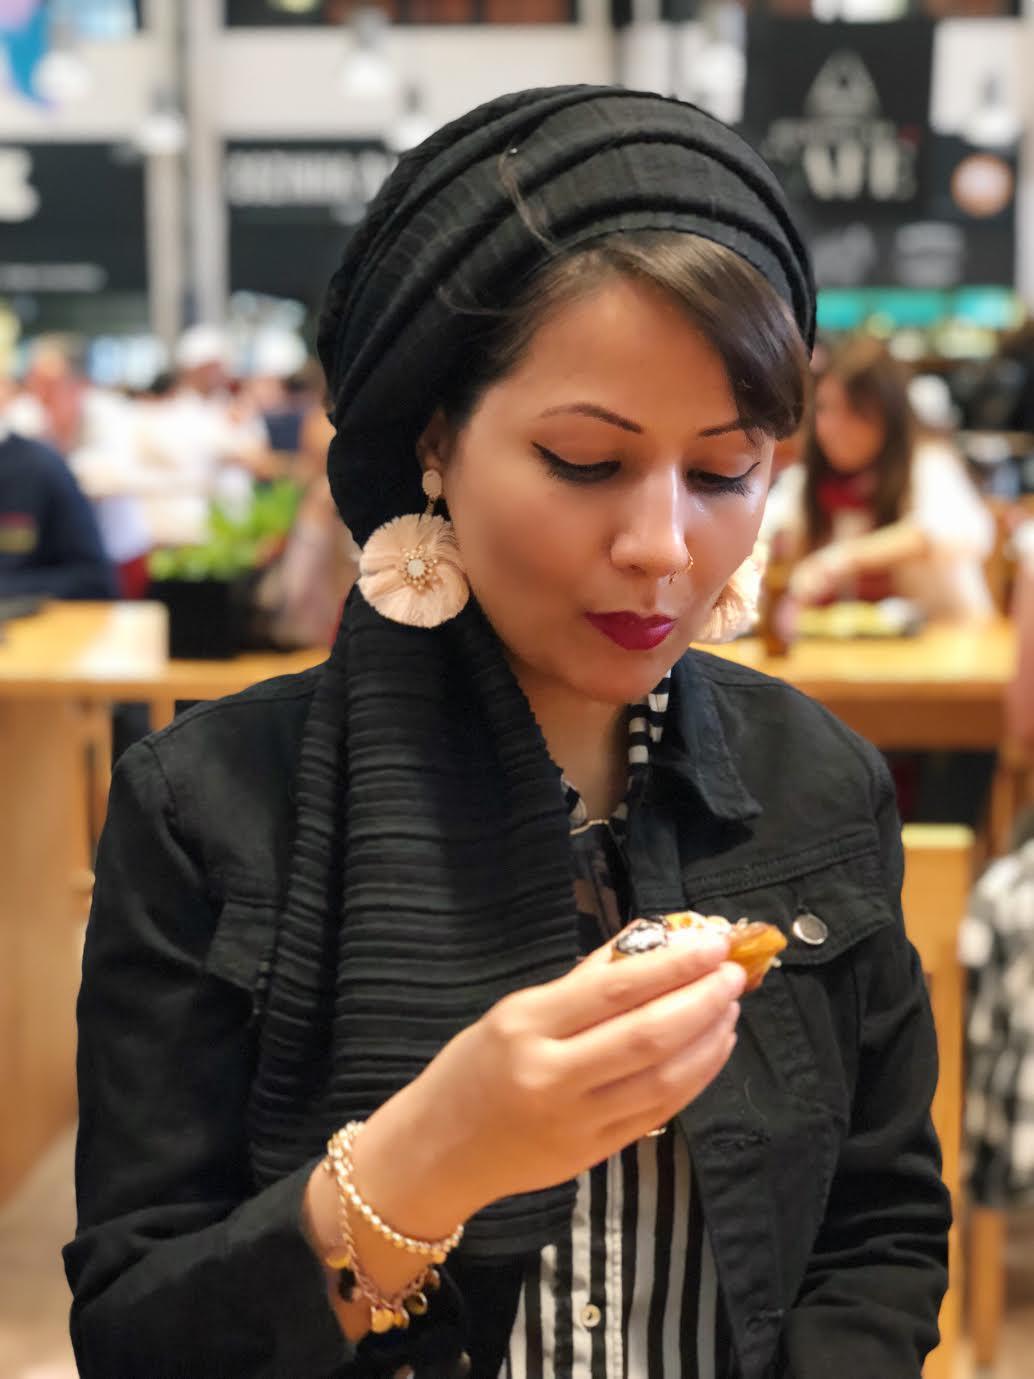 Muslim-travel-tips-Lisbon-halal-food